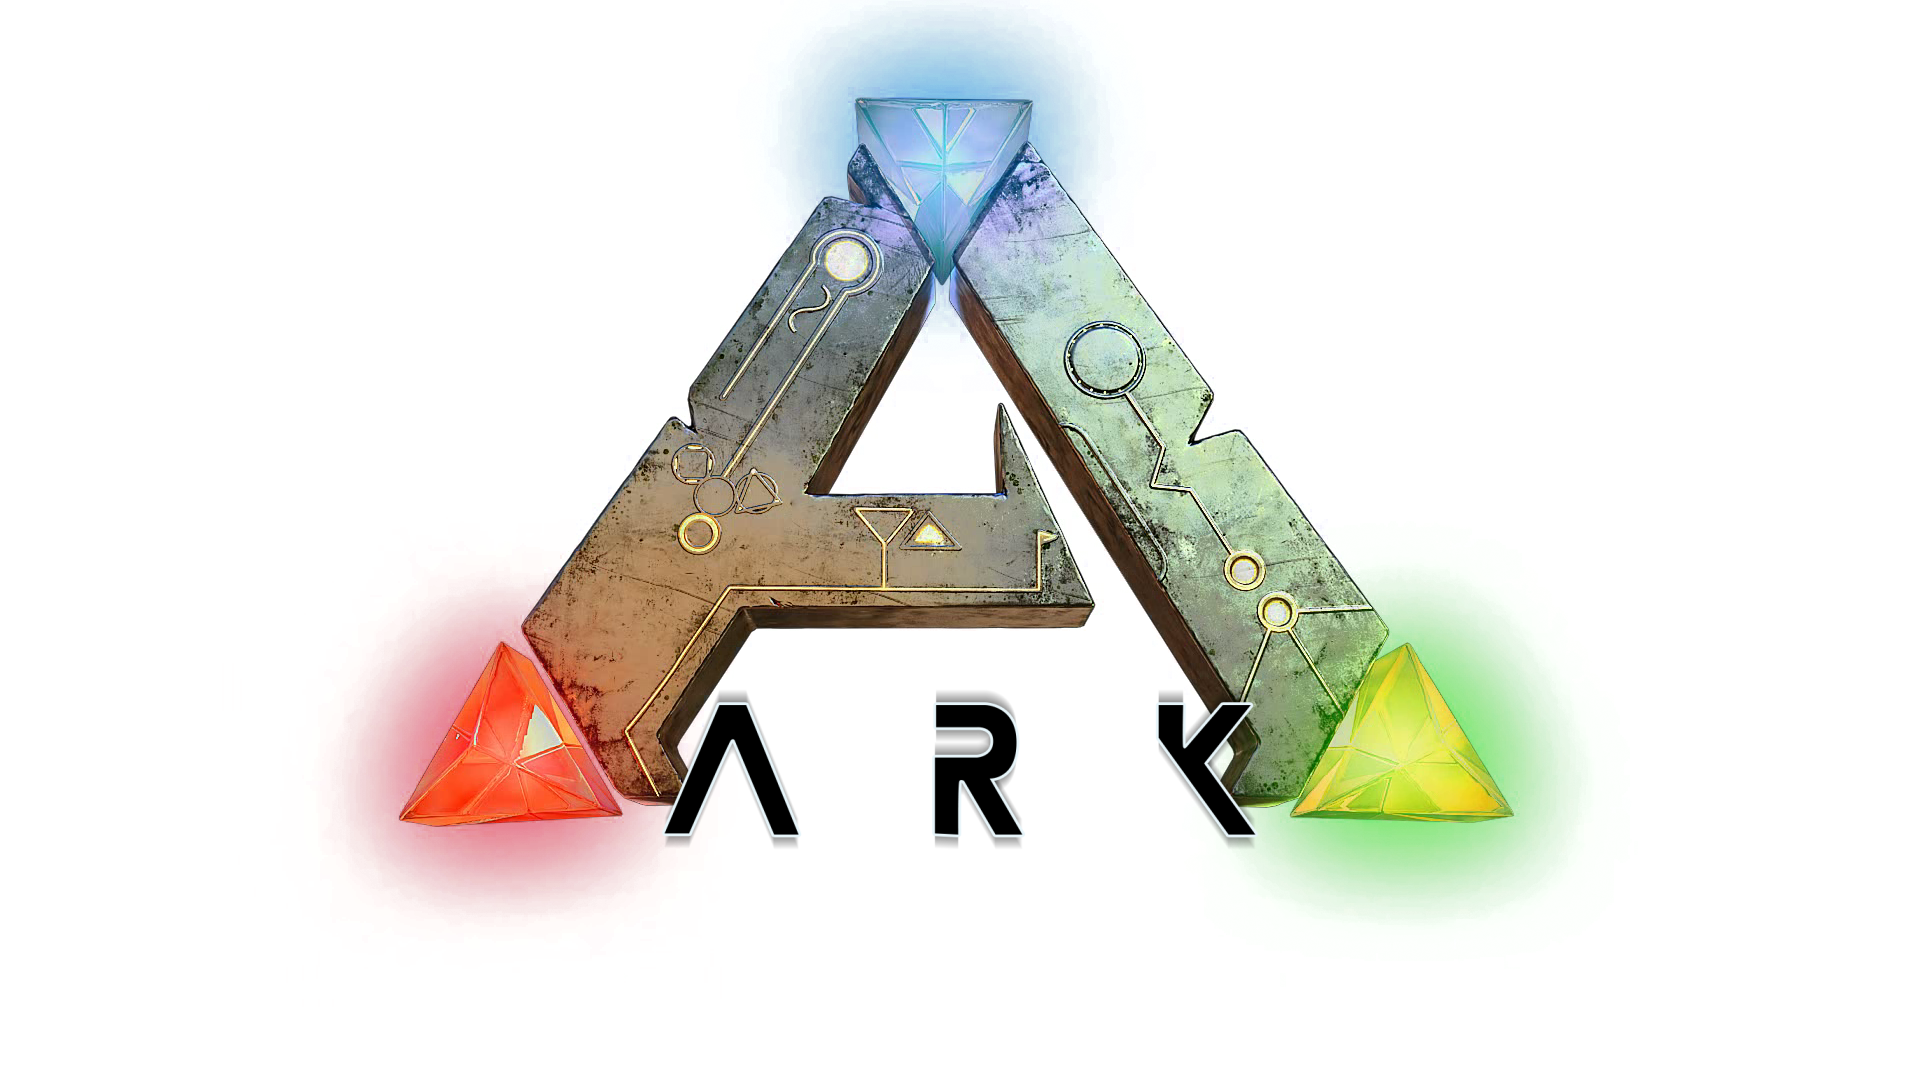 Ark server usage poll